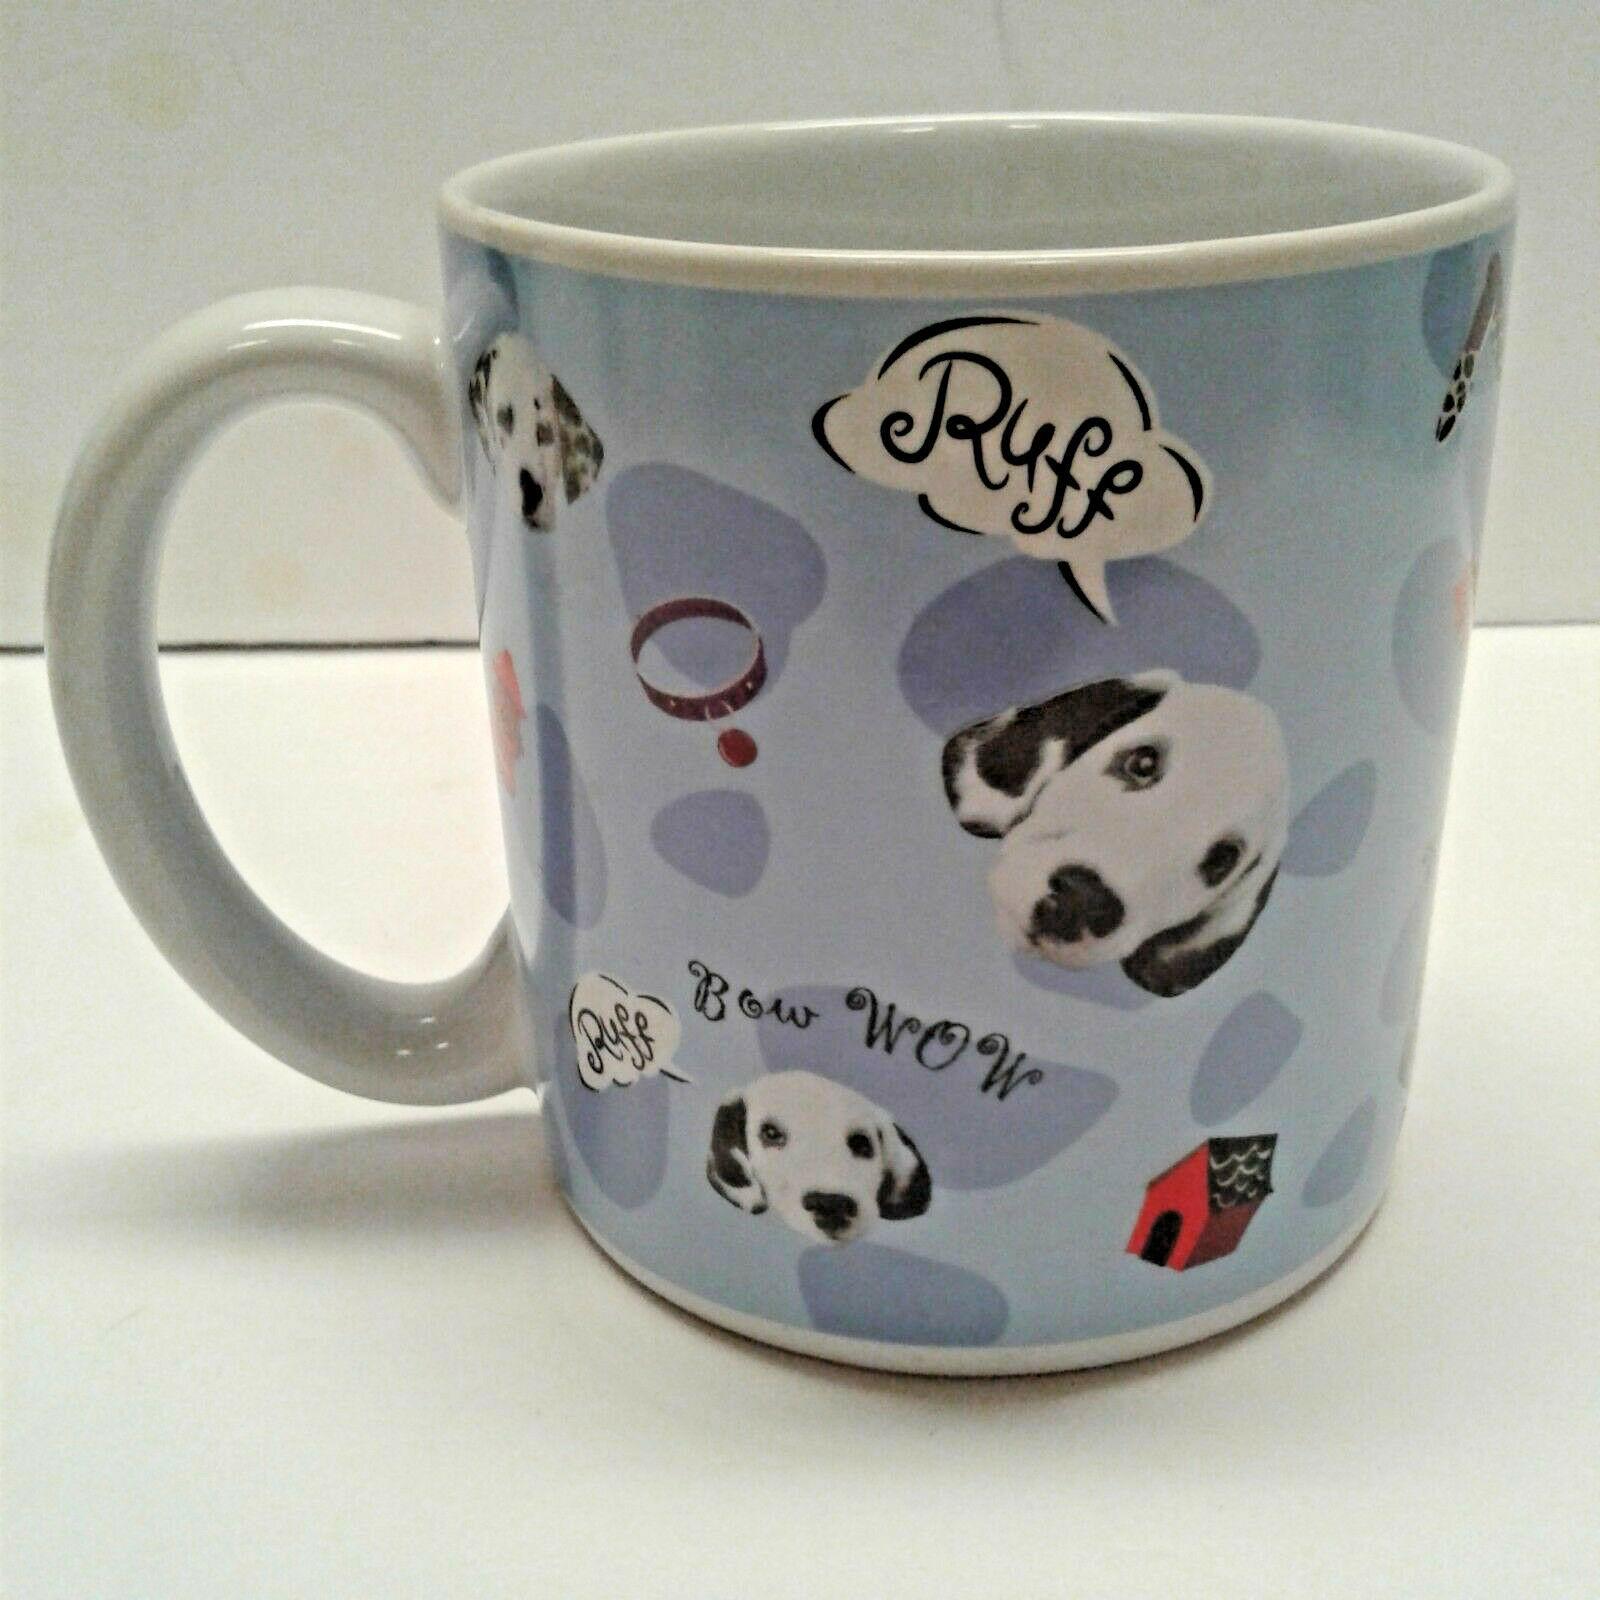 Disney Bow Wow Dalmations oversized 16 oz coffee mug Blue Bones Dog House